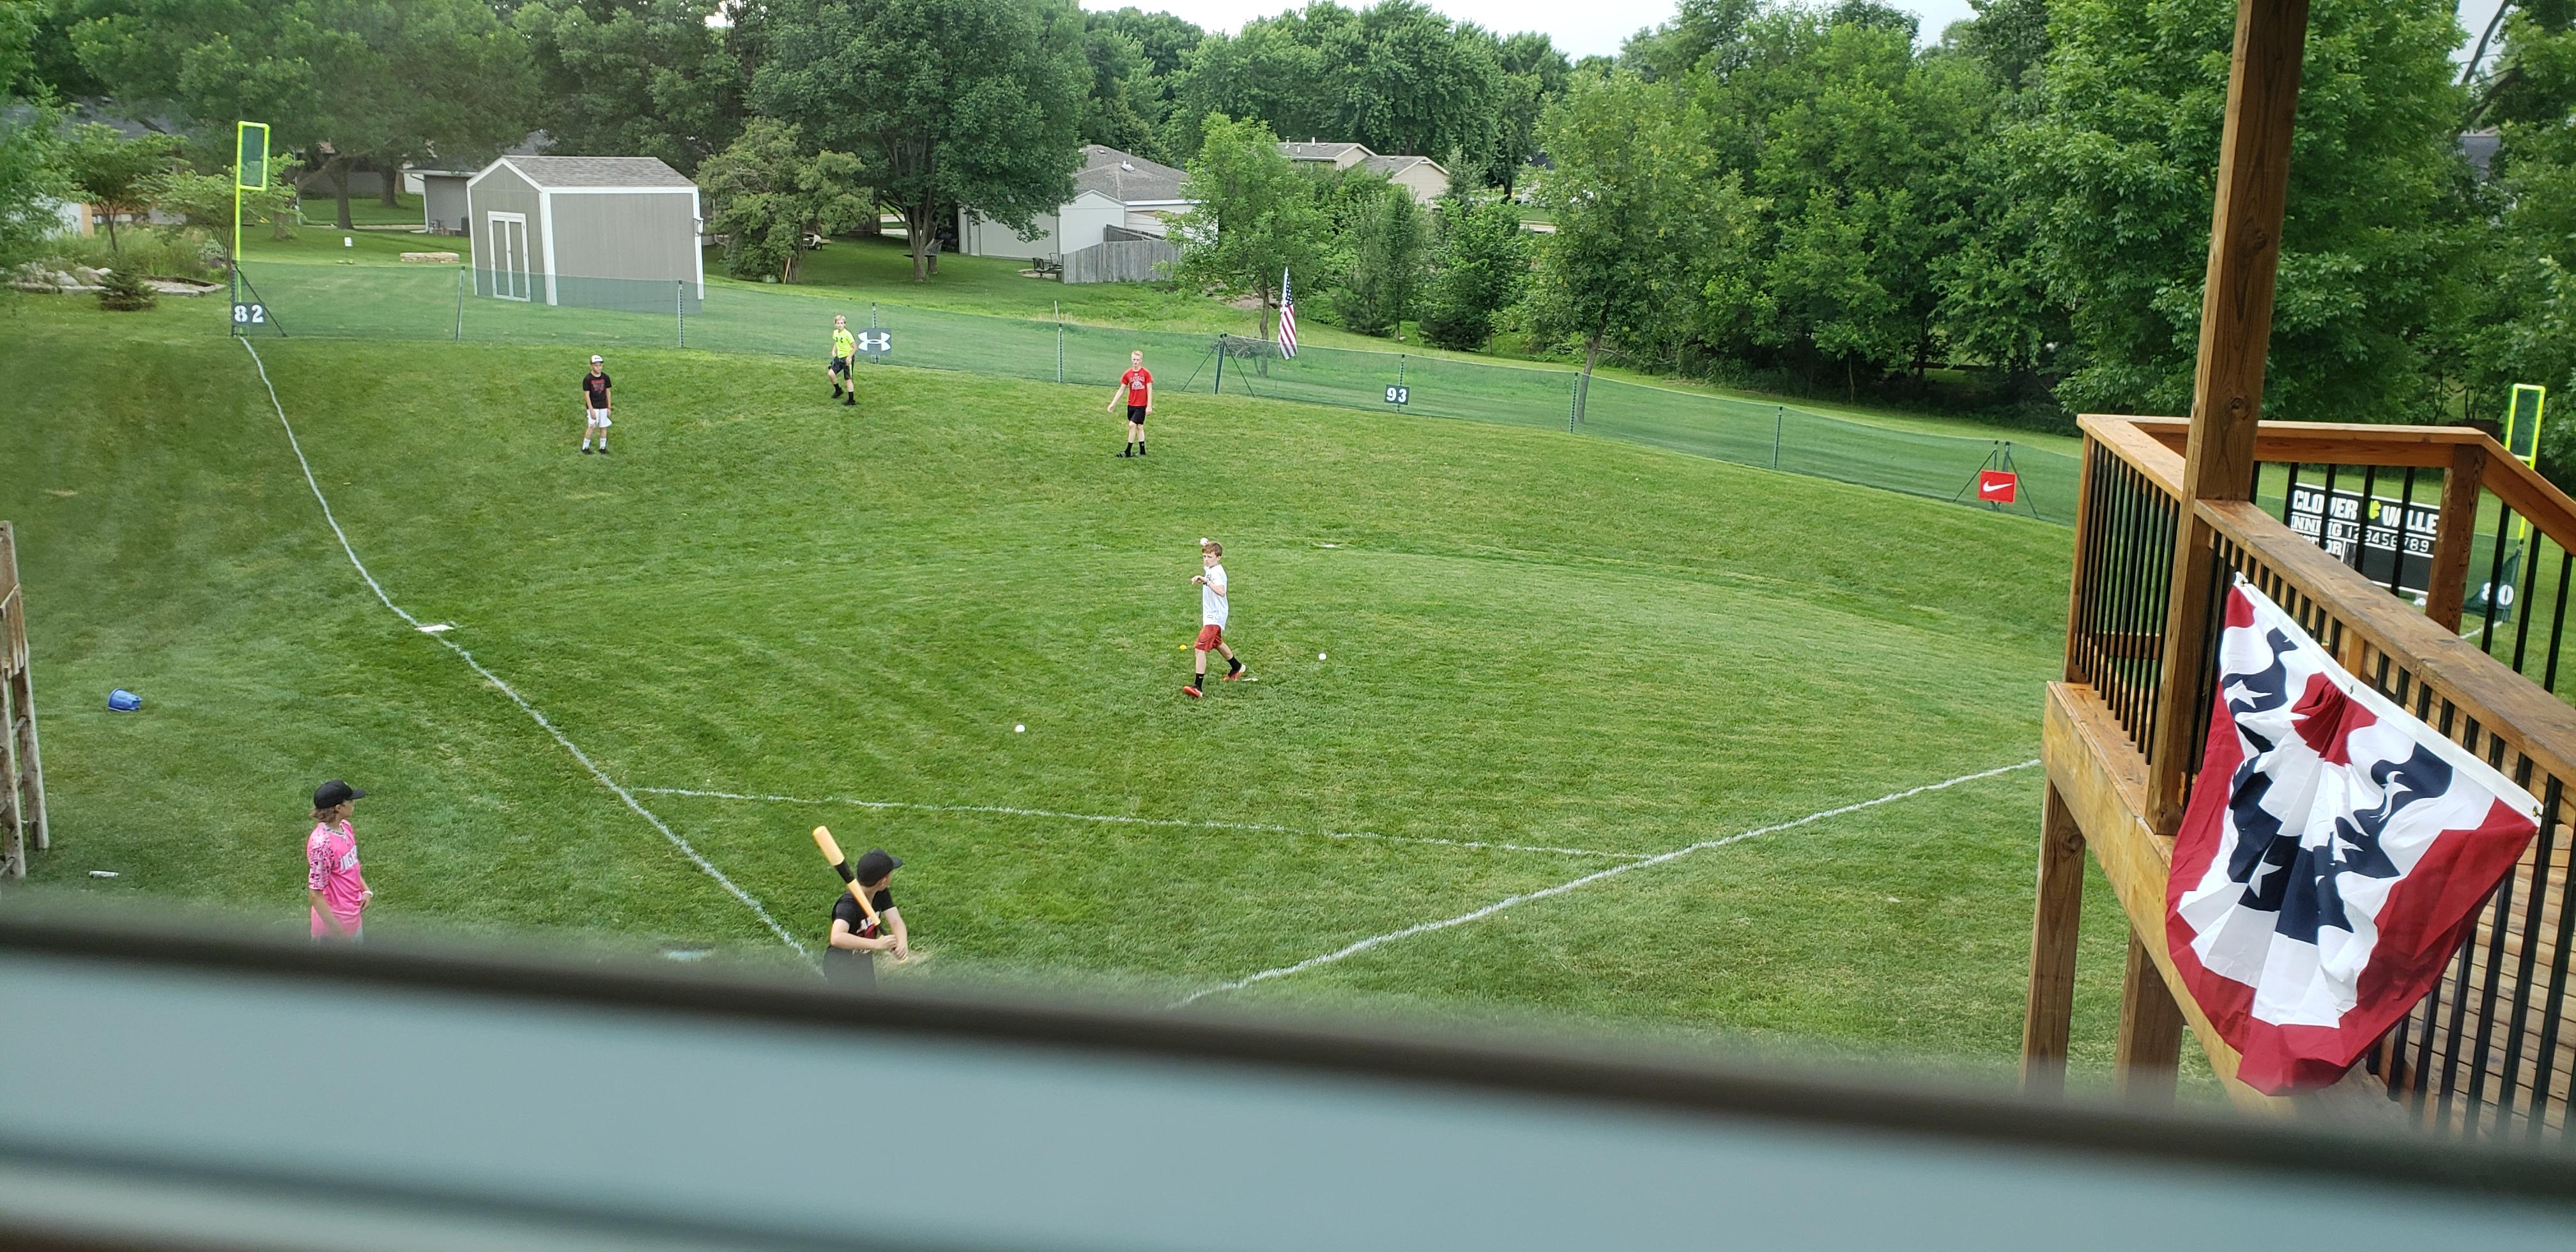 clover-wiffle-ball-field-1.jpg